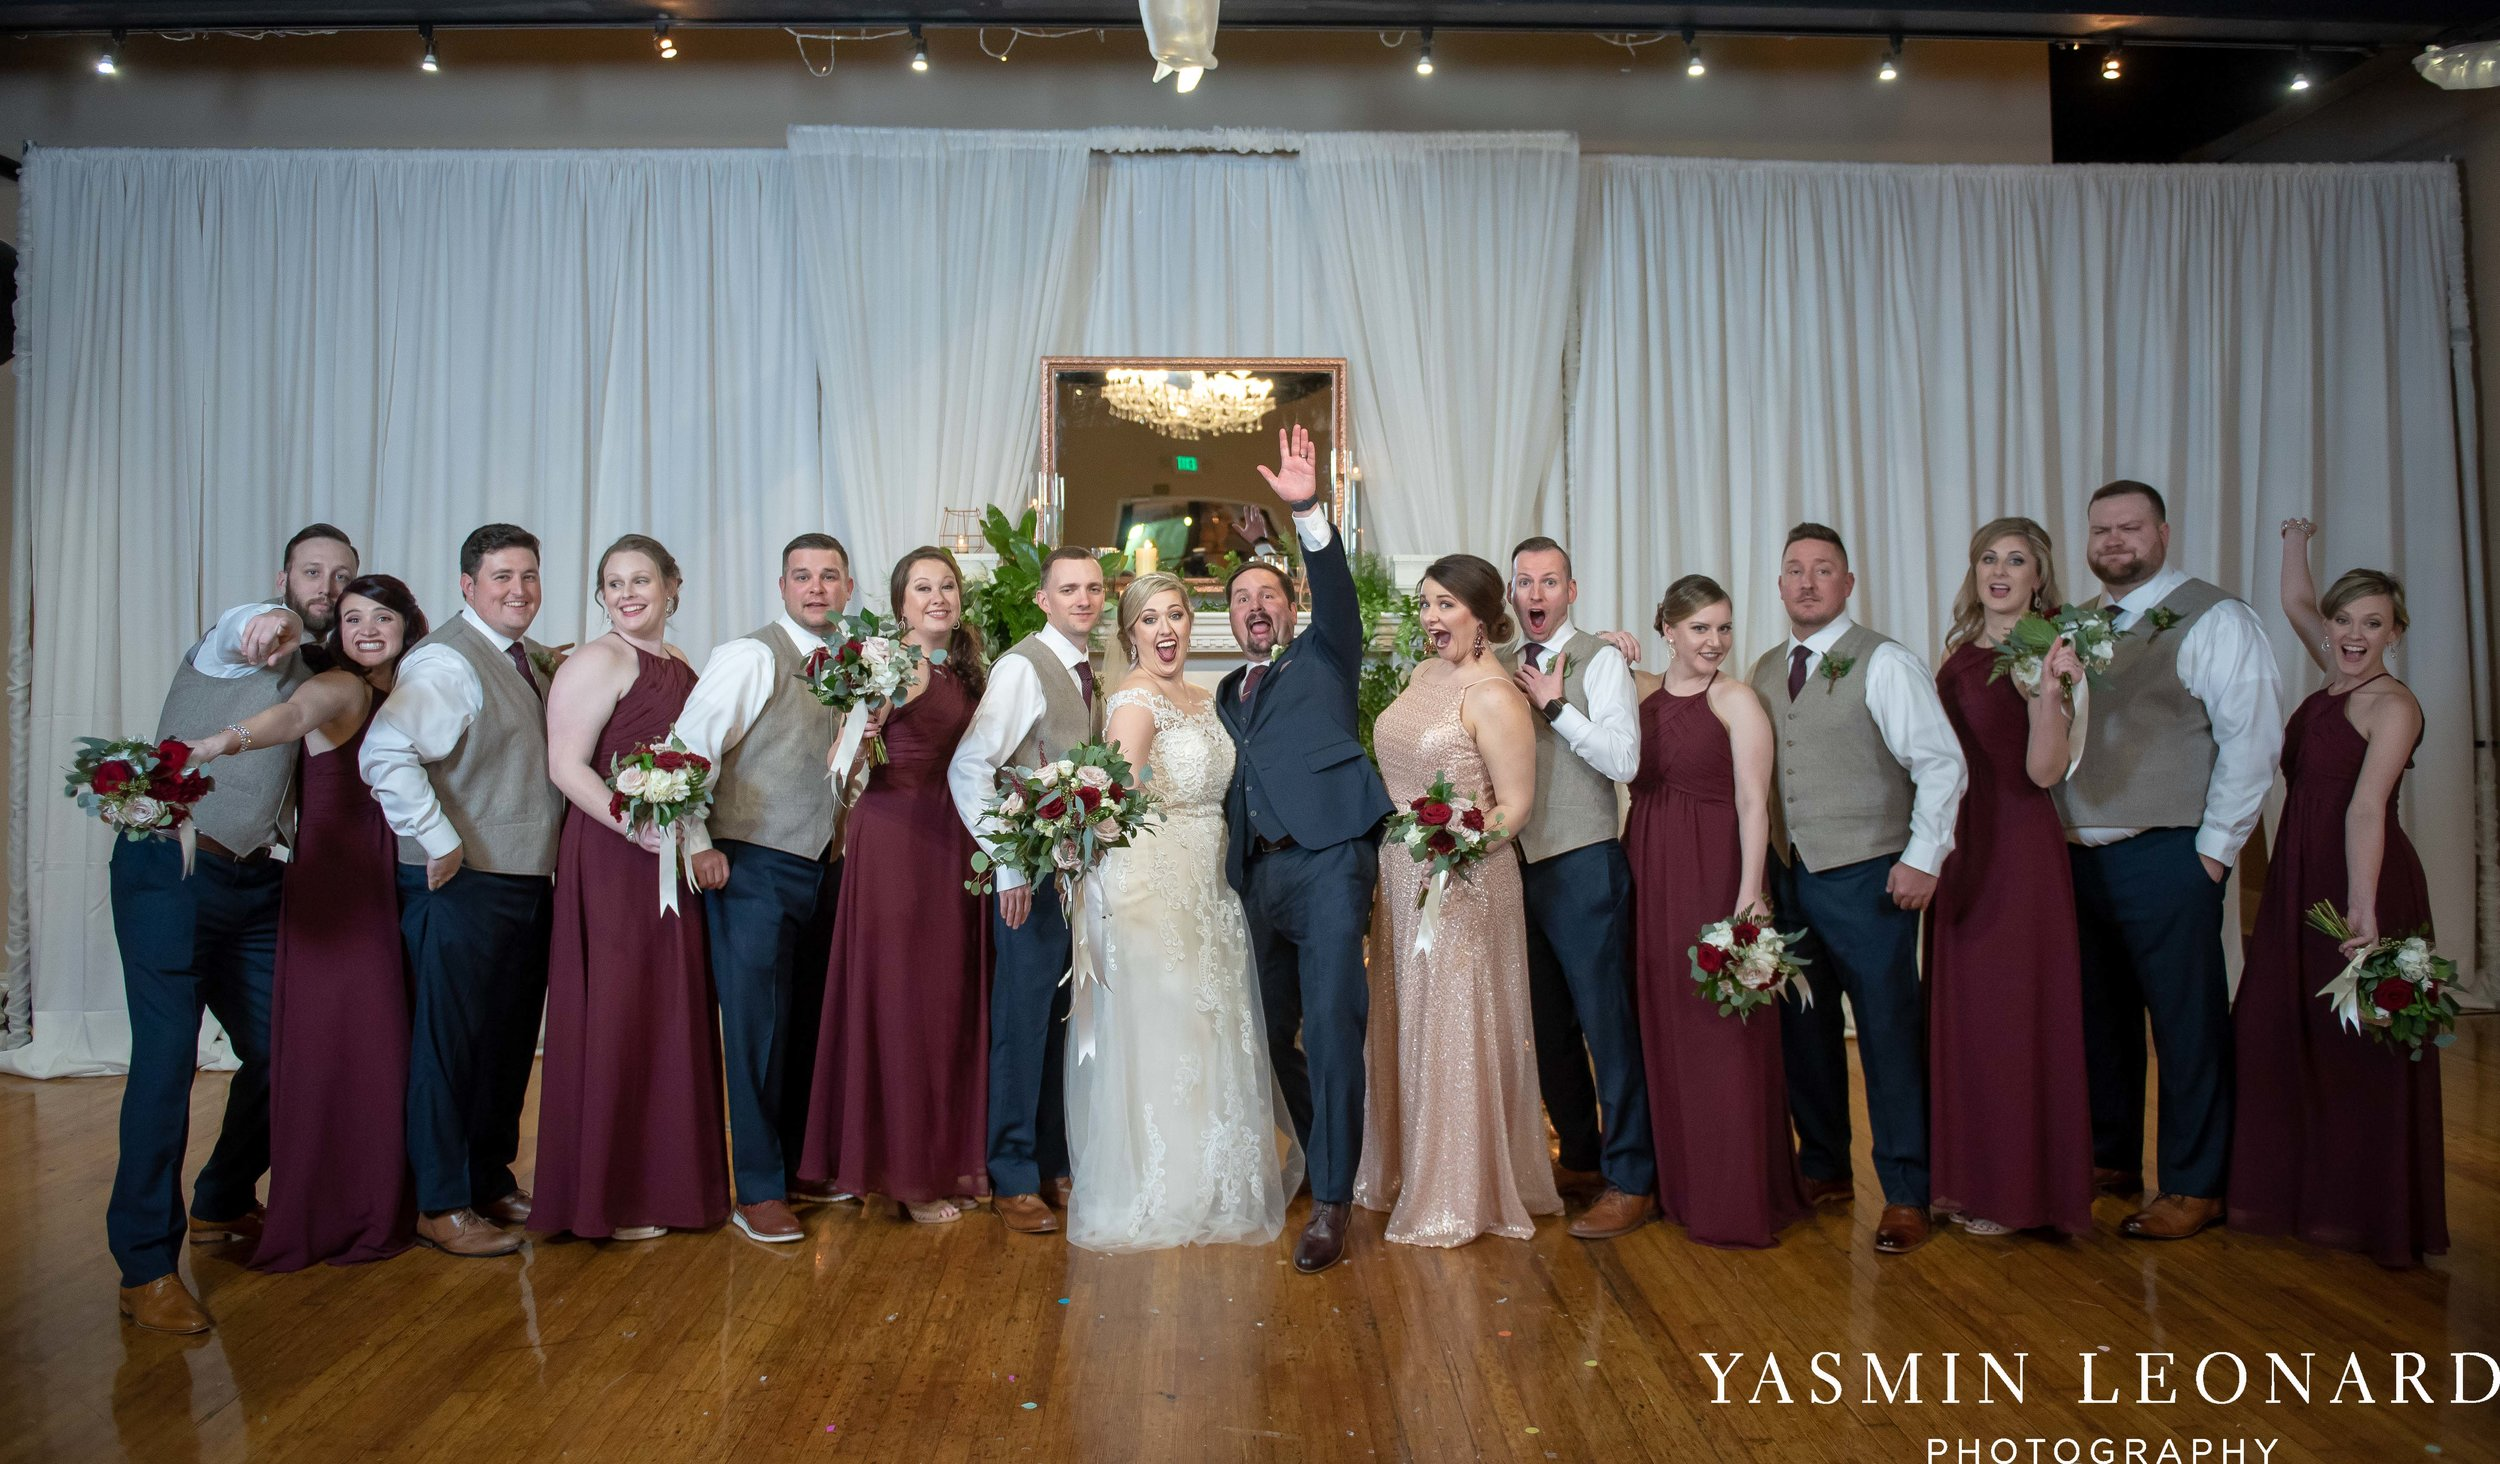 Rebekah and Matt - 105 Worth Event Centre - Yasmin Leonard Photography - Asheboro Wedding - NC Wedding - High Point Weddings - Triad Weddings - Winter Wedding-33.jpg